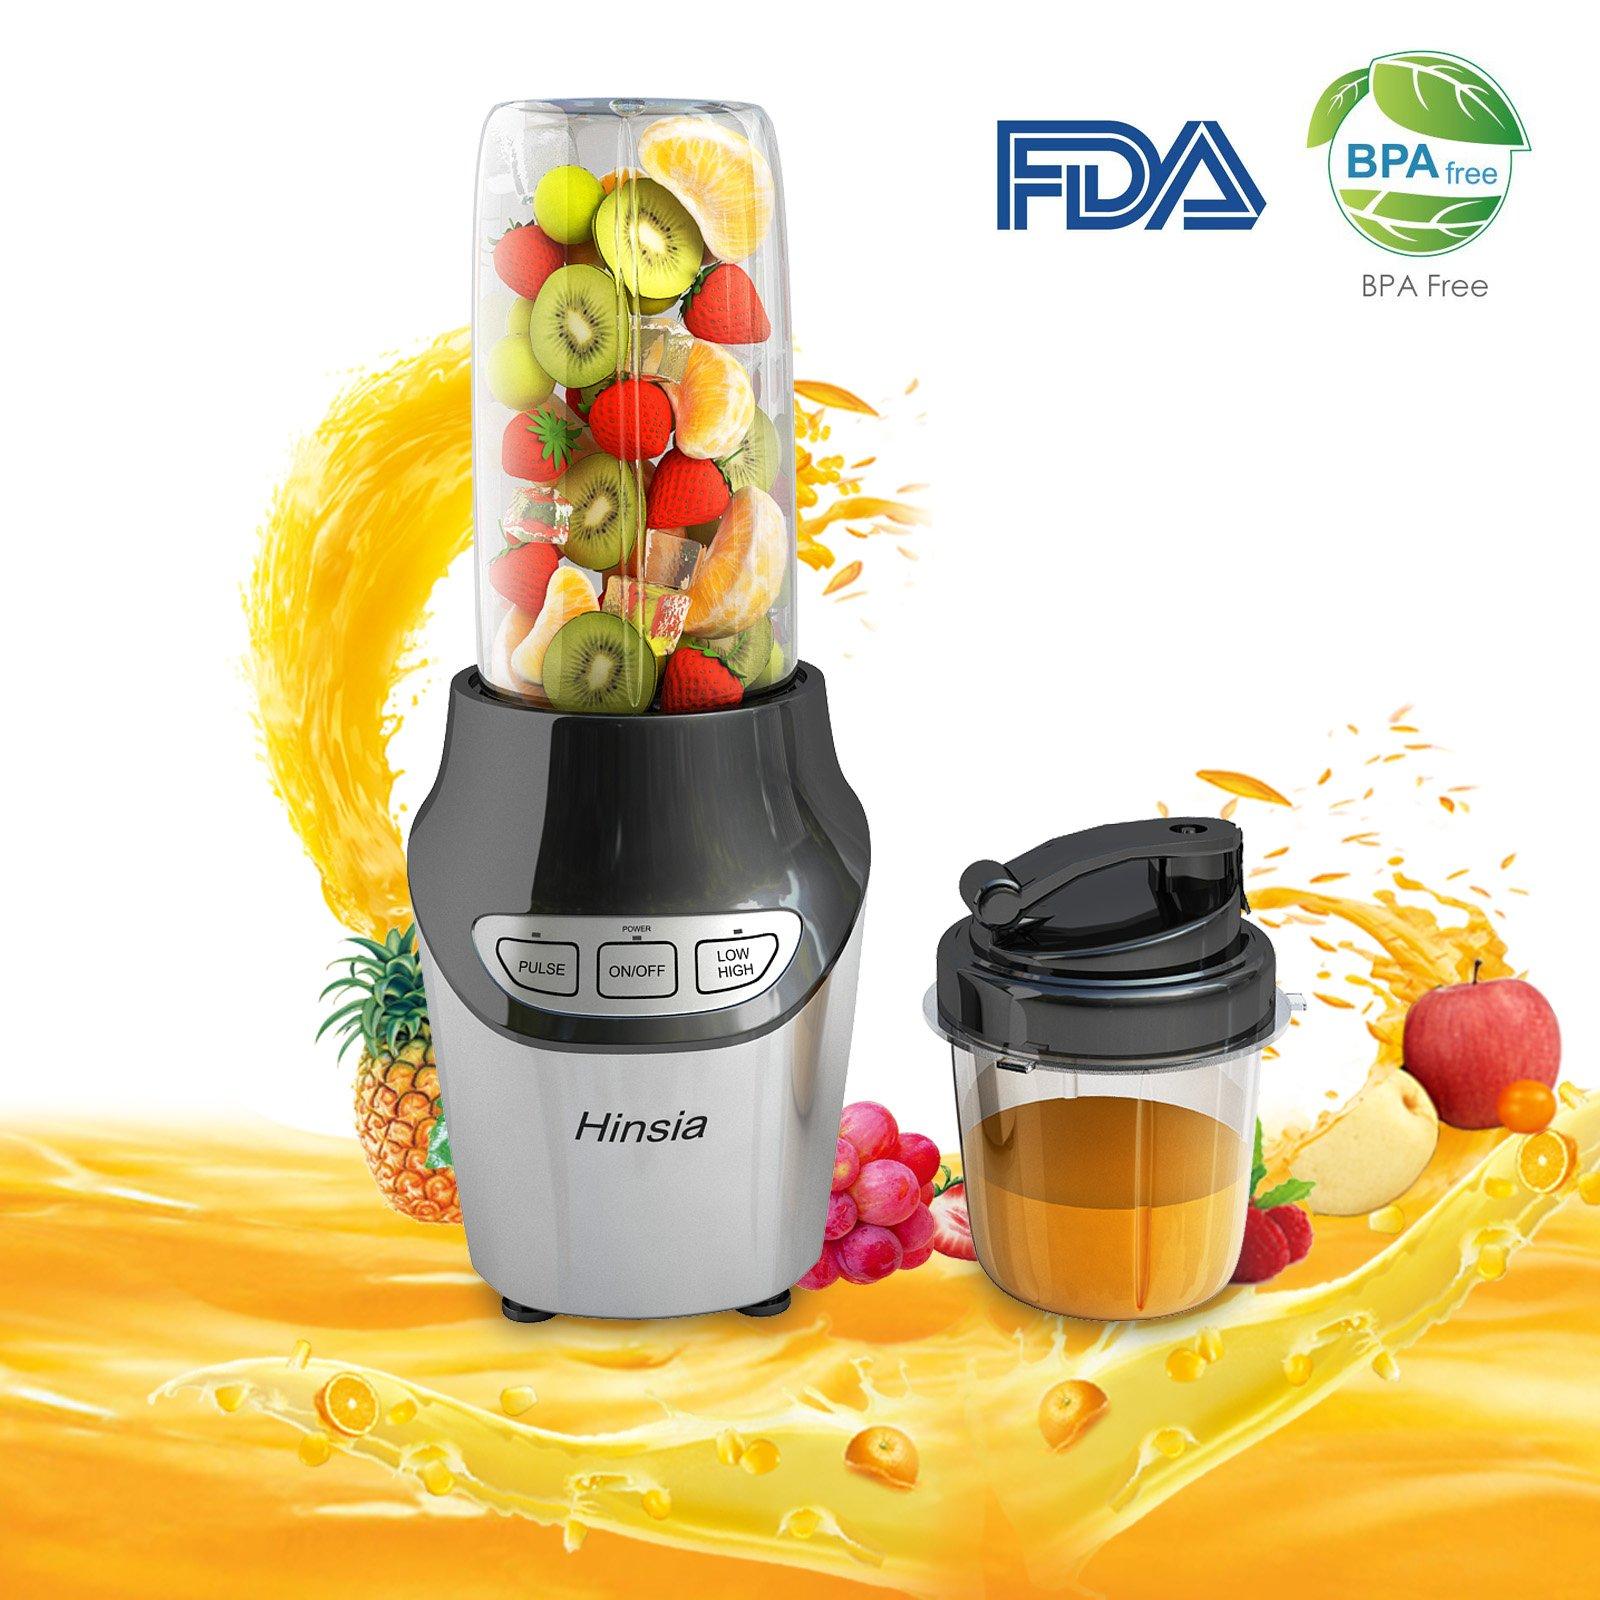 Hinsia FDA-approved Smoothie Blender 1000 Watt BPAfree Processor Juicer Blender and Smoothie Maker High Power Blender Shakes